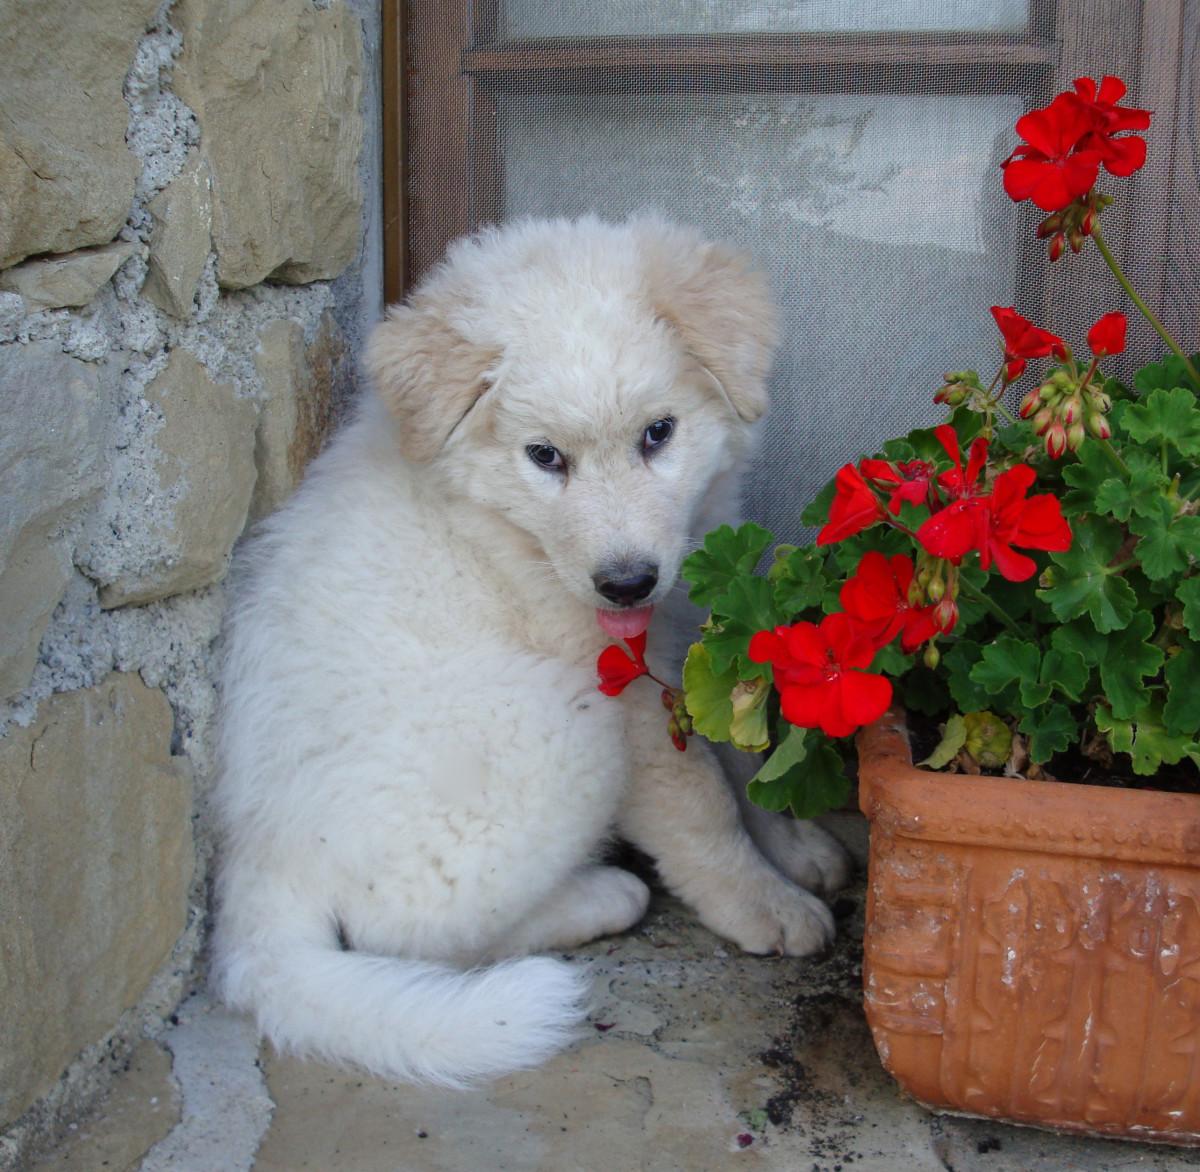 (cc image, Wikimedia Commons) Maremma Sheepdog Puppy